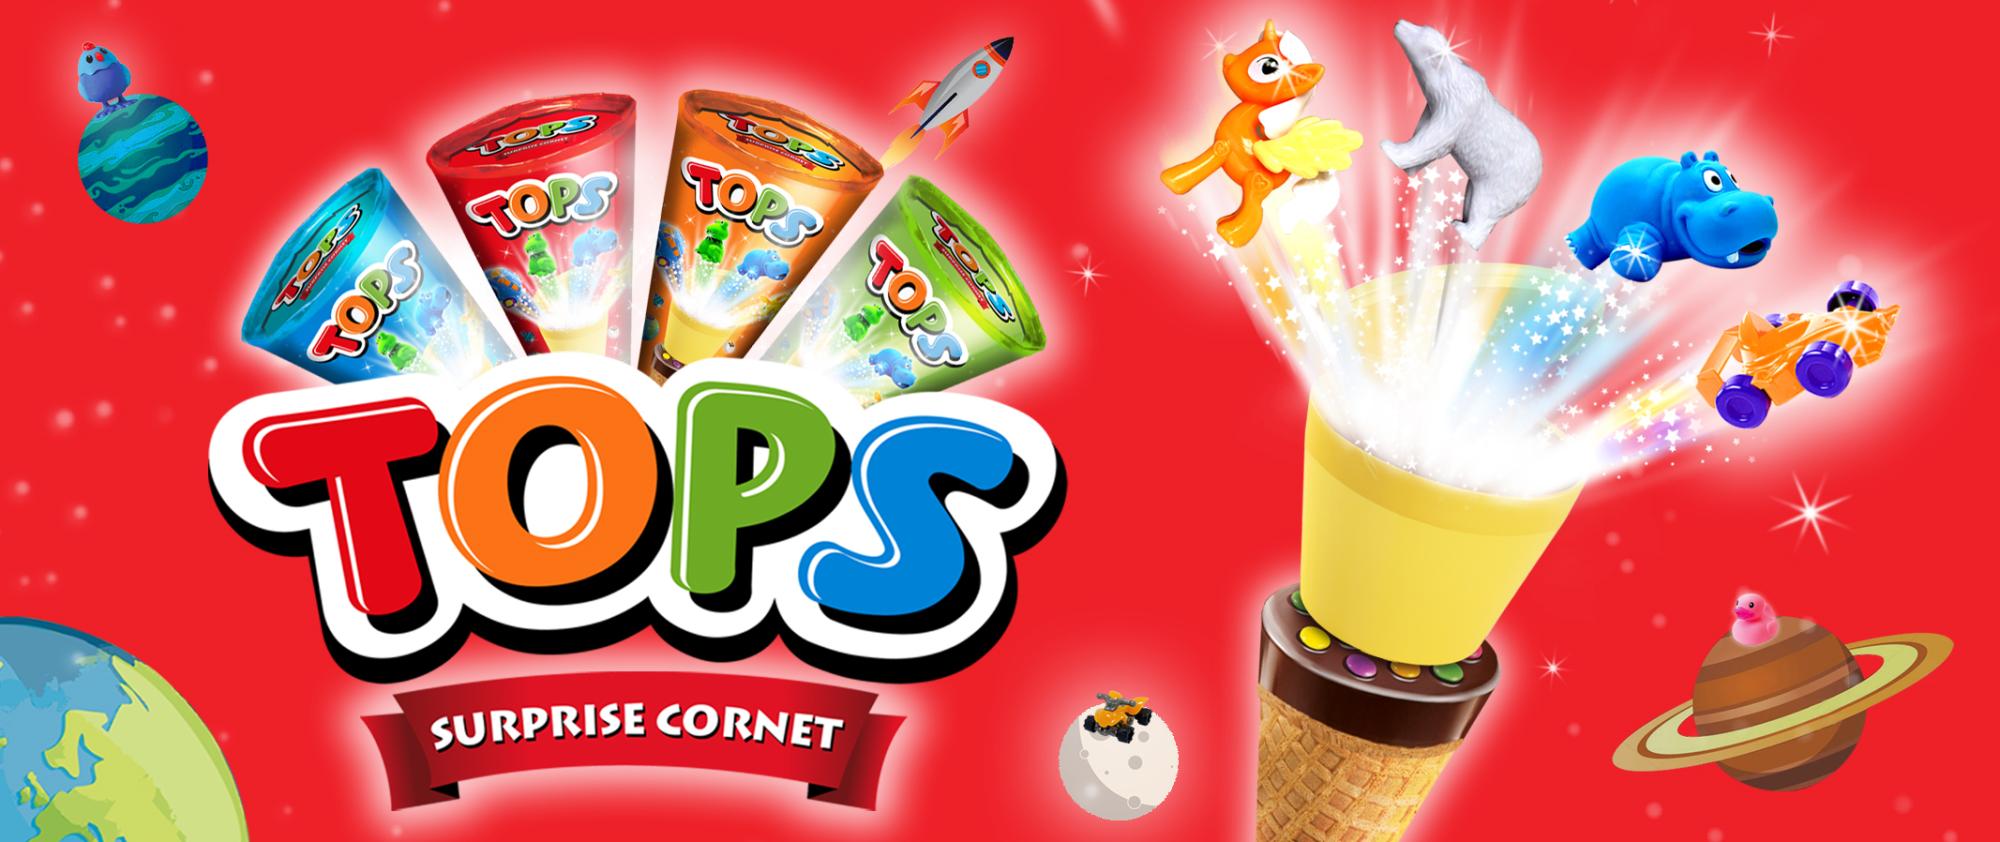 Tops Surprise Cornet Choco